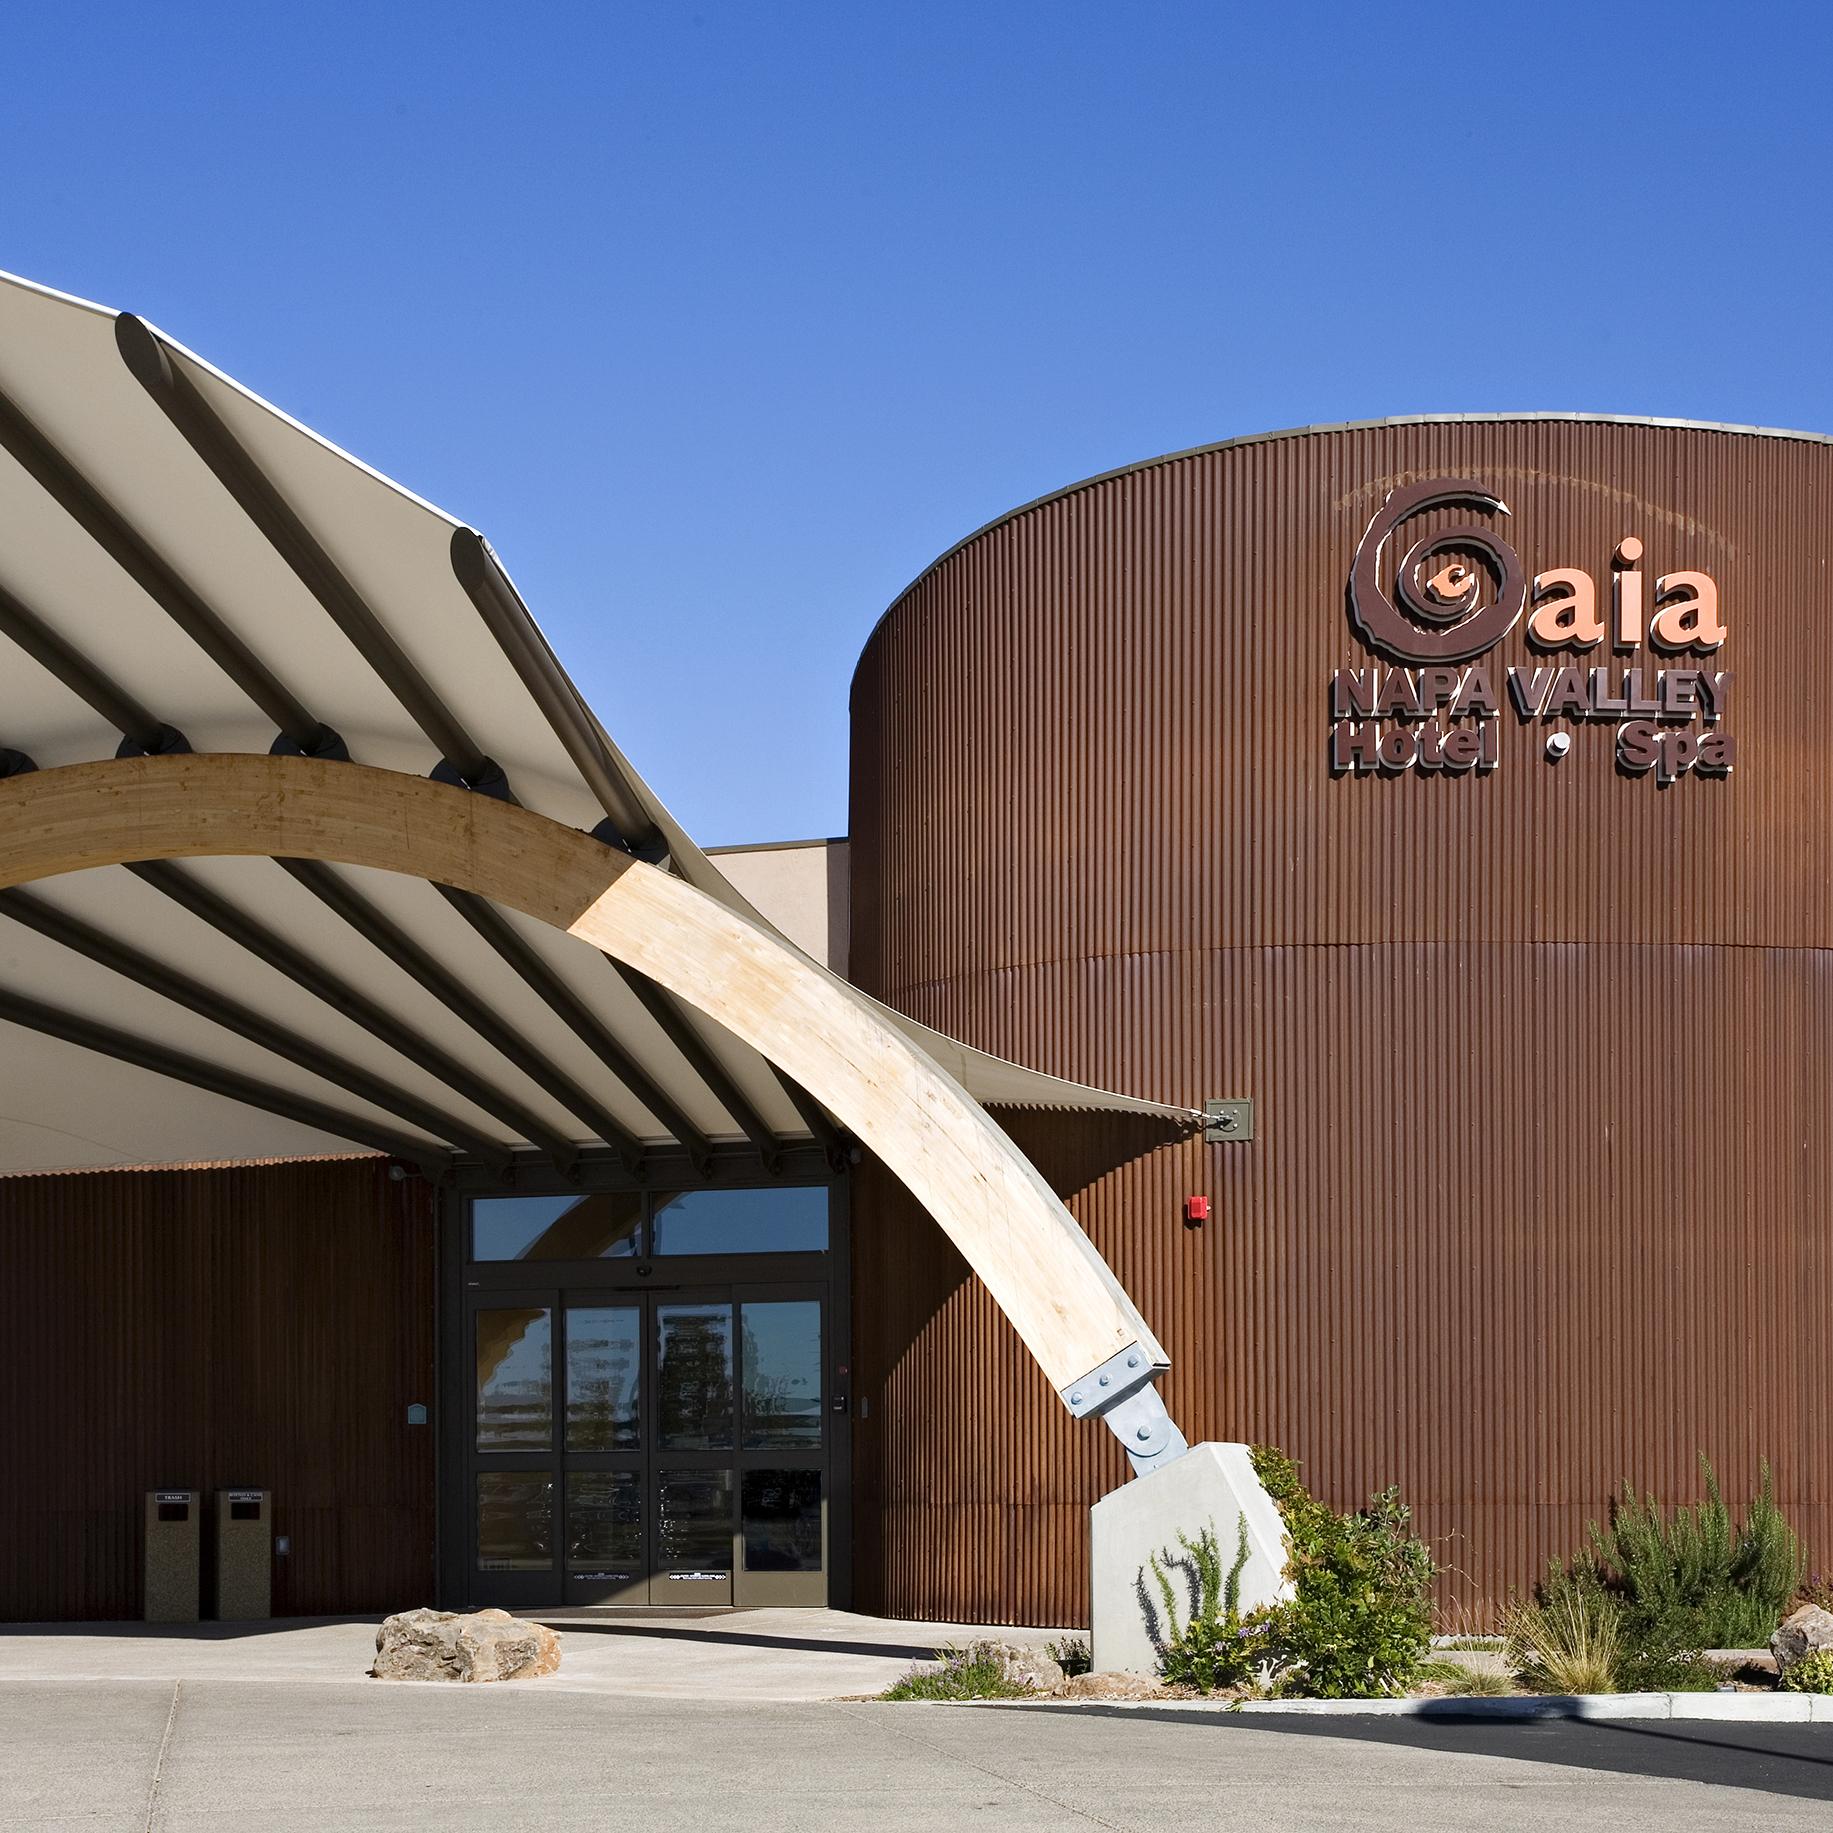 Gaia Napa Hotel